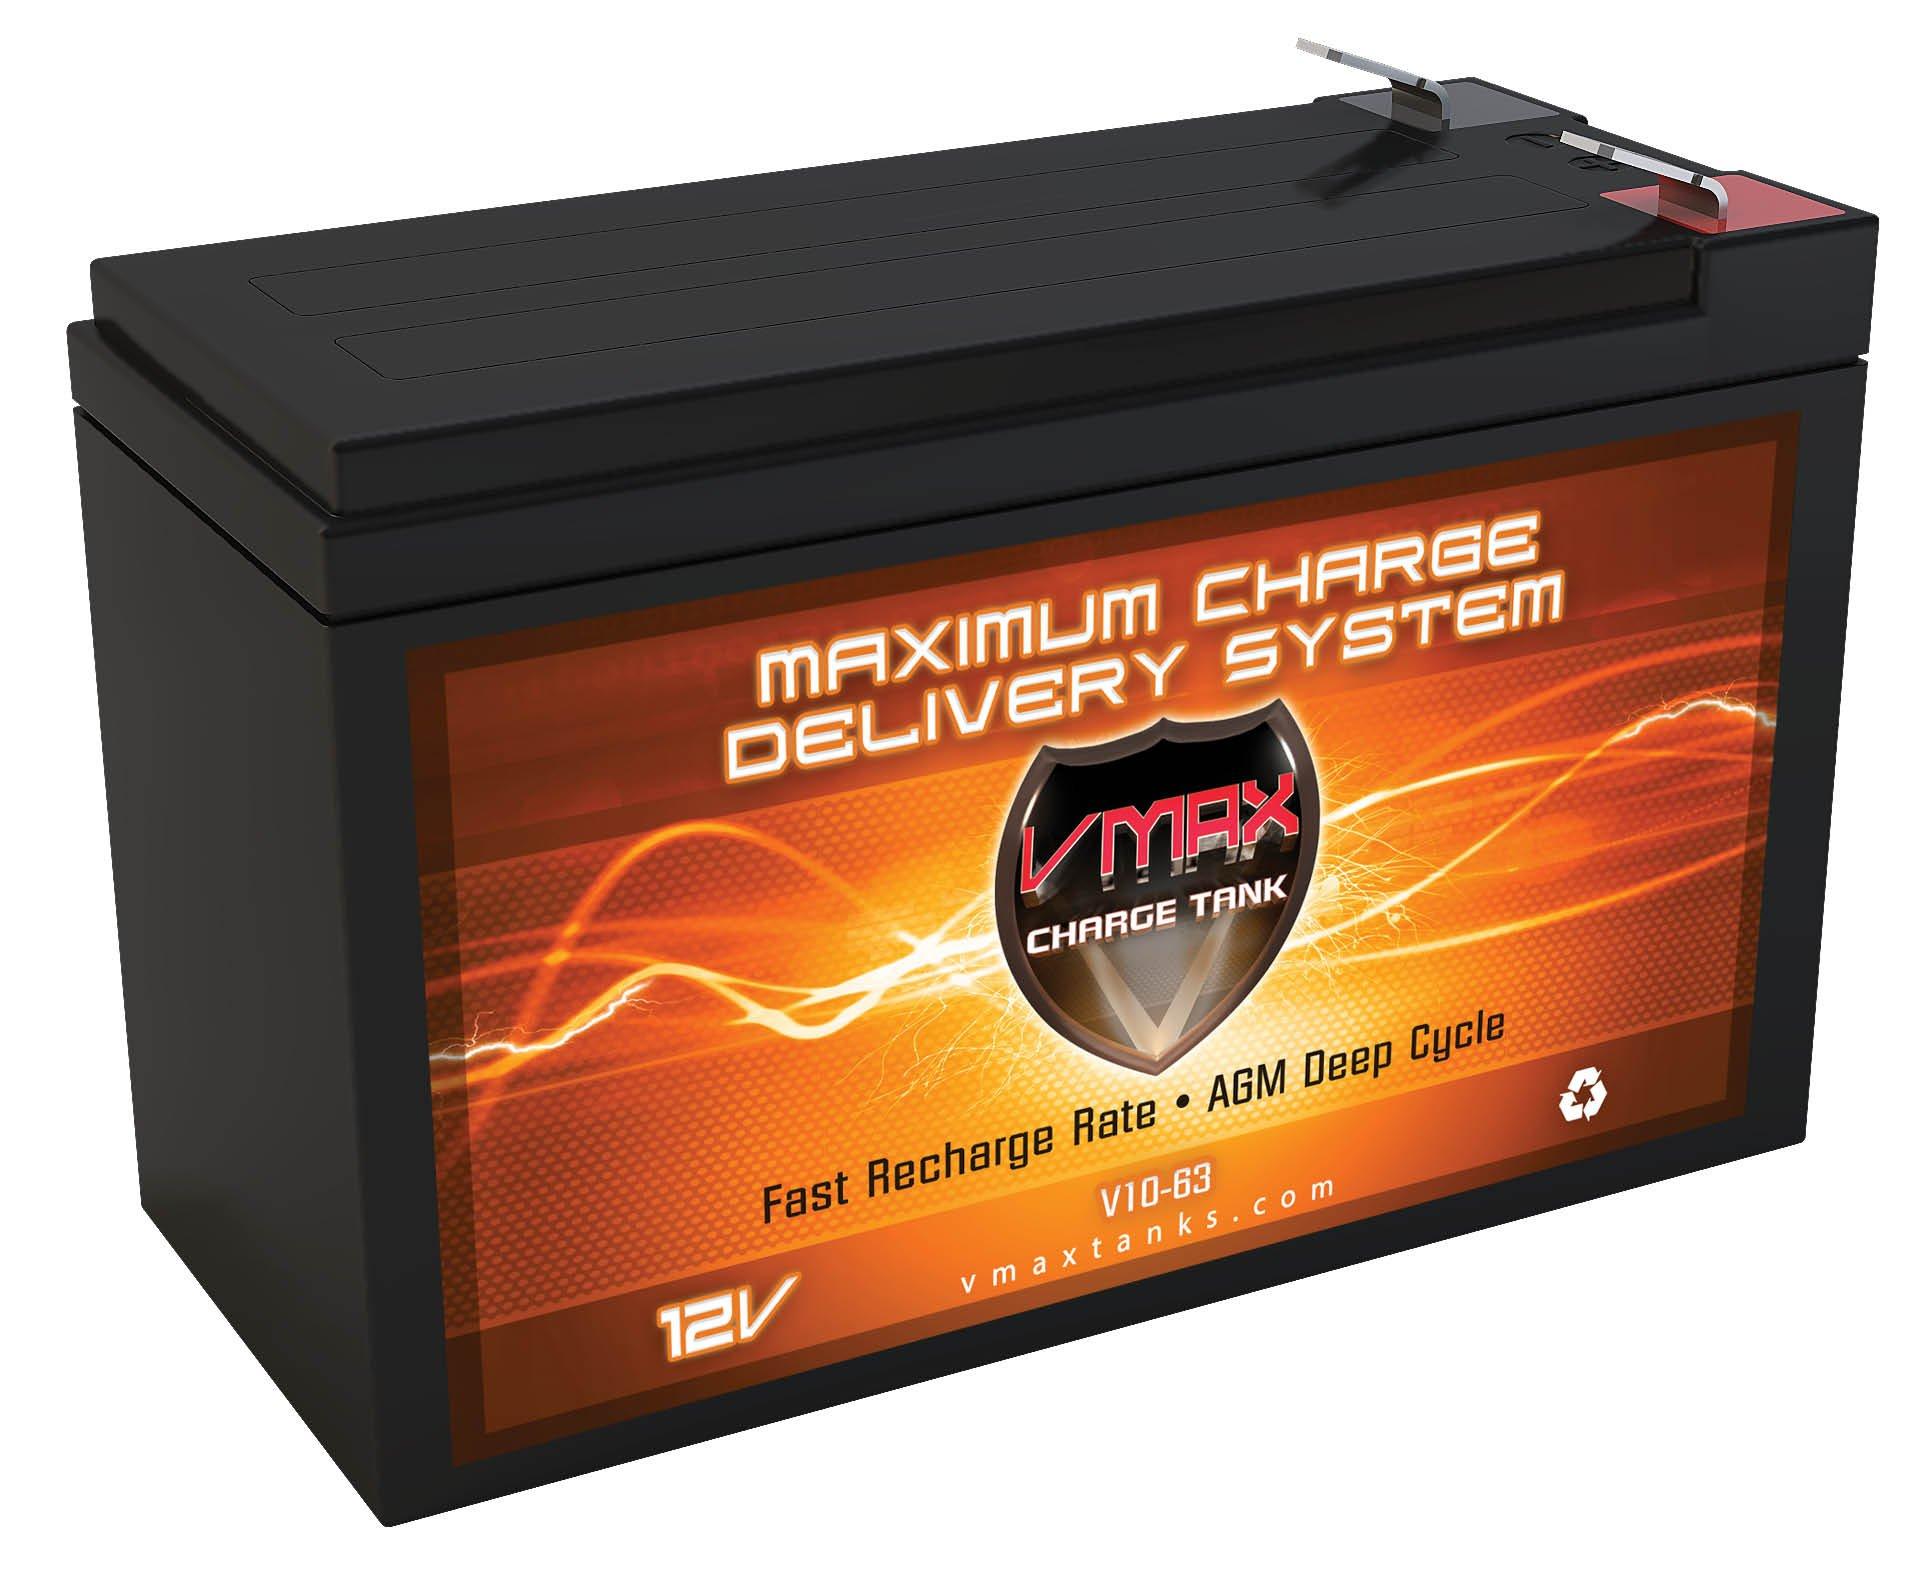 VMAXTANKS V10-63 12 Volt 10AH AGM Deep Cycle 12V SLA Battery for Tripp Lite OMNI700LCD UPS System